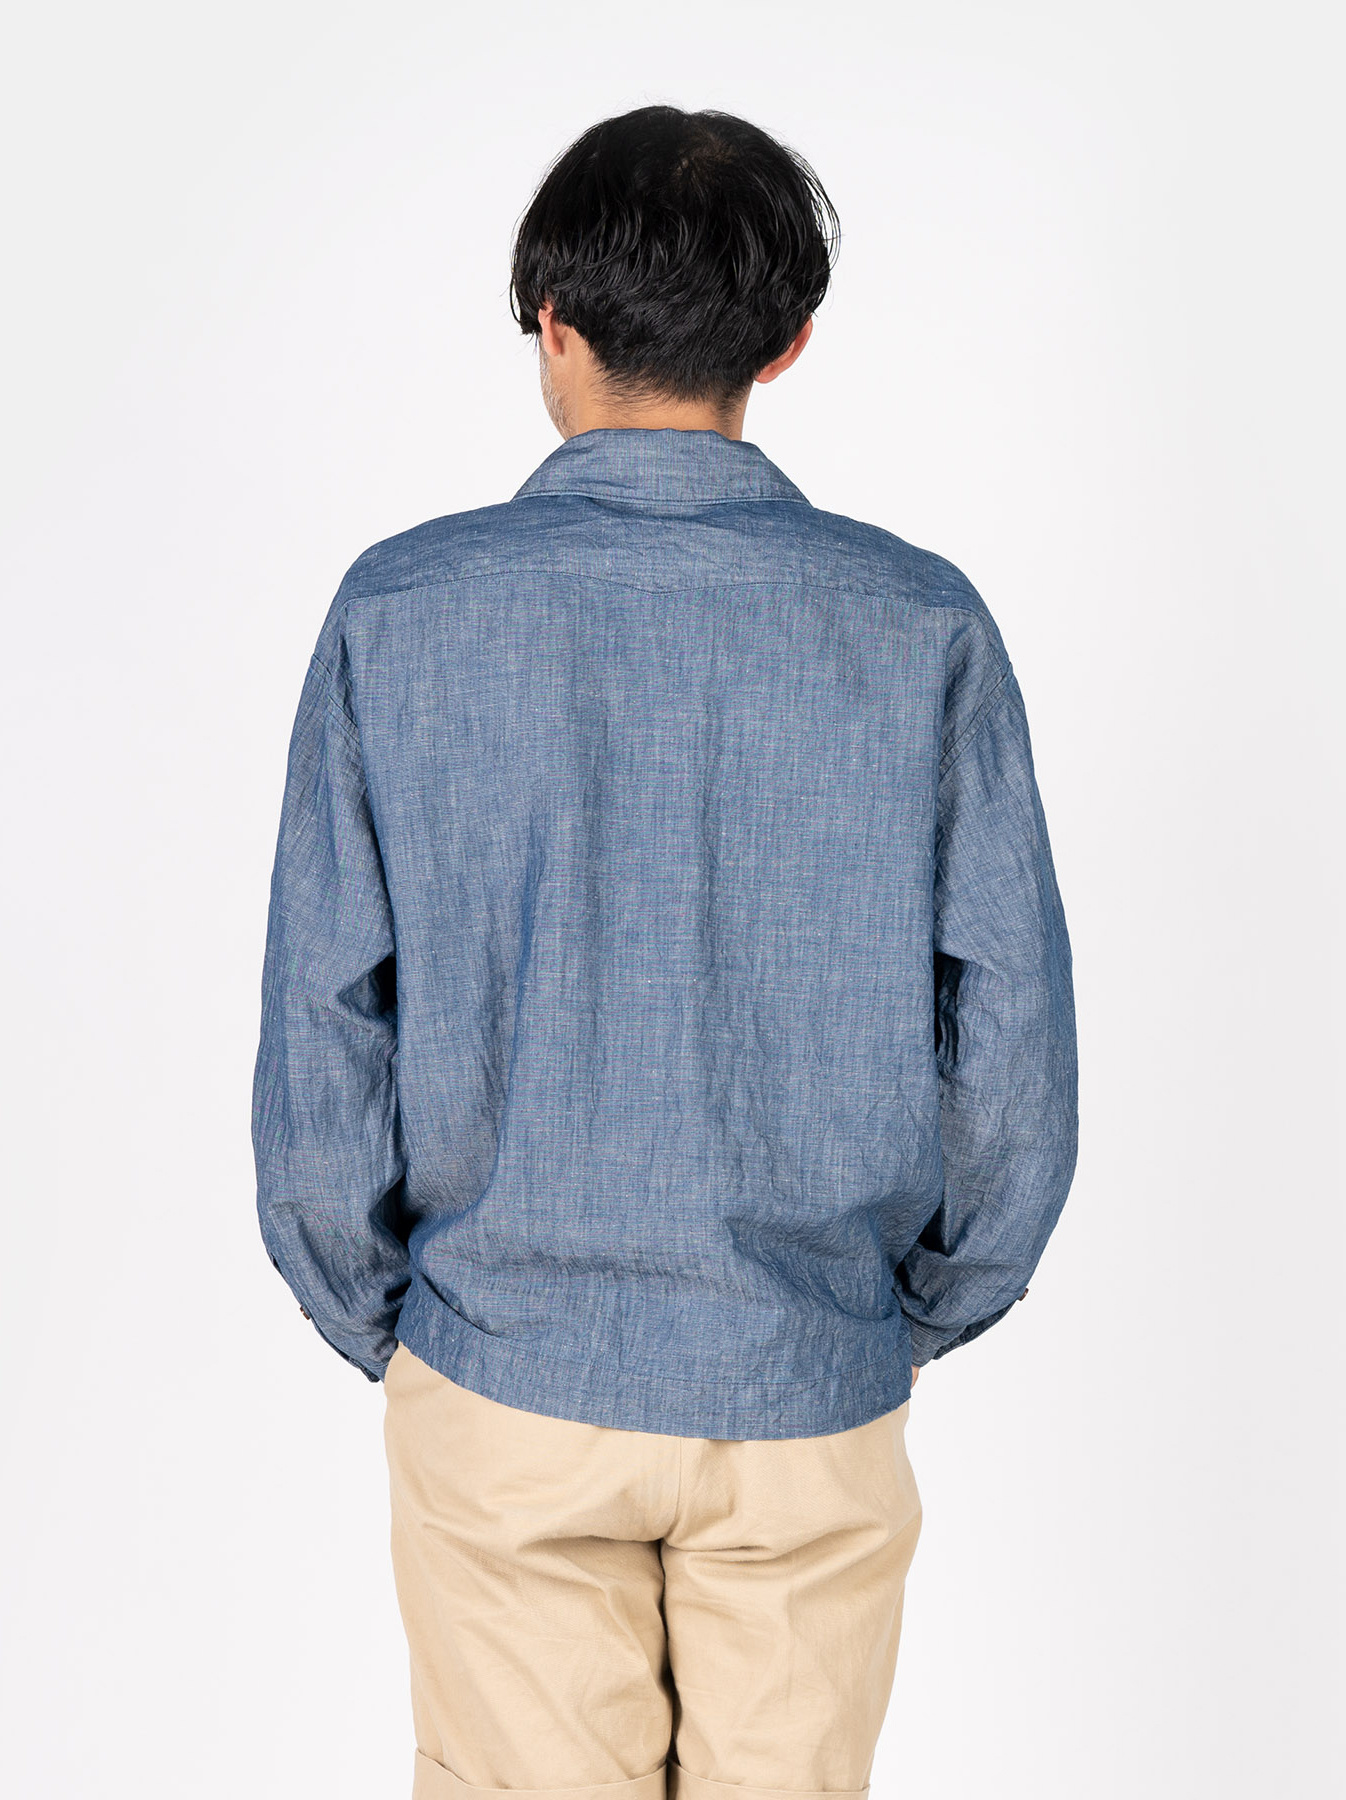 WH Cotton Linen Umahiko Pullover Shirt-5